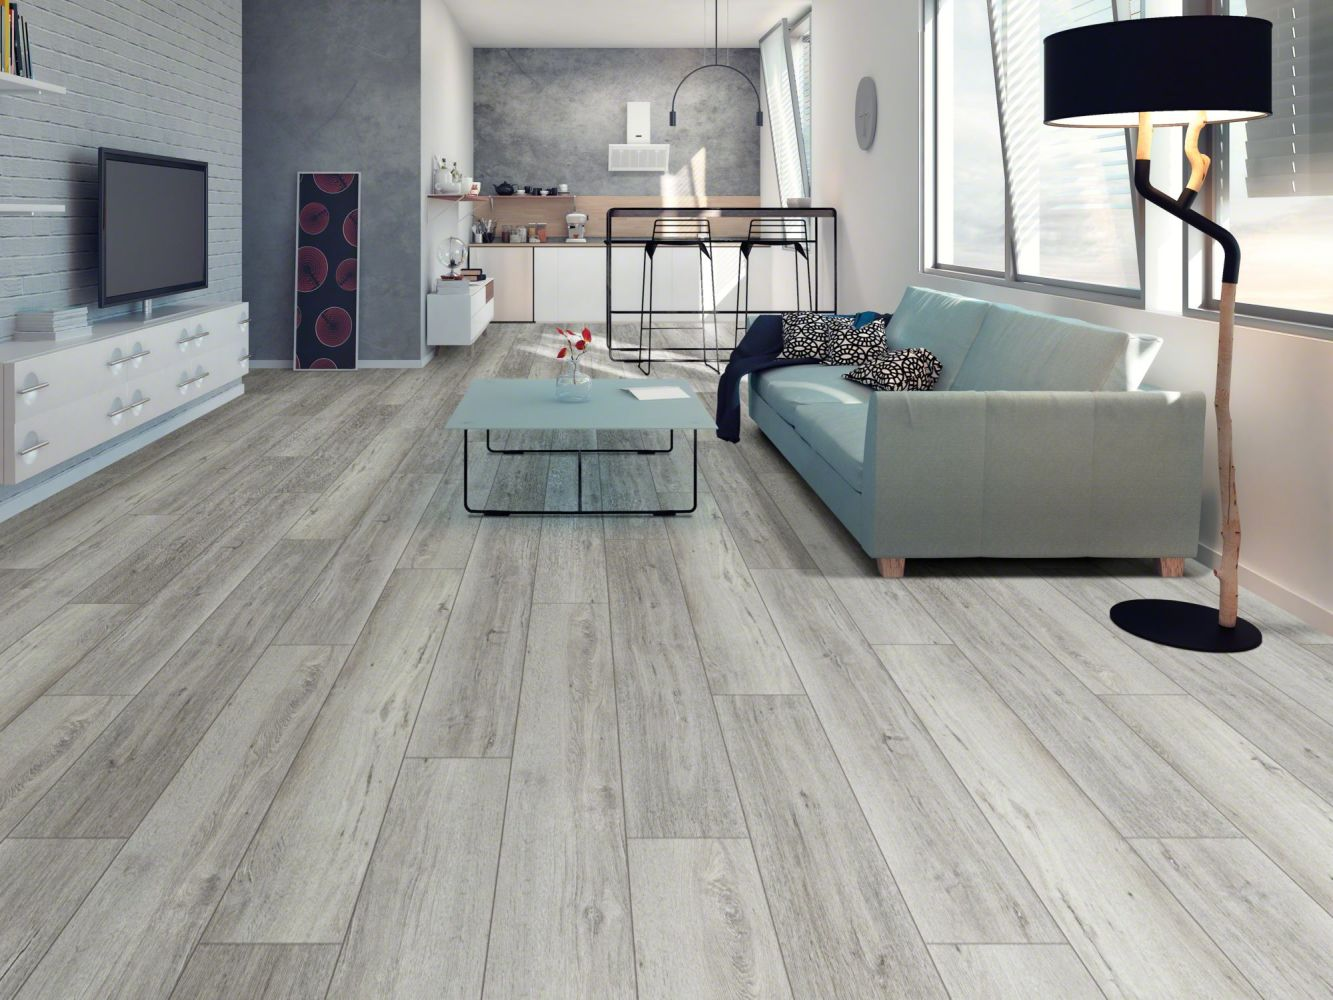 Shaw Floors Nfa HS Beaver Creek Wye Oak 05004_VH544